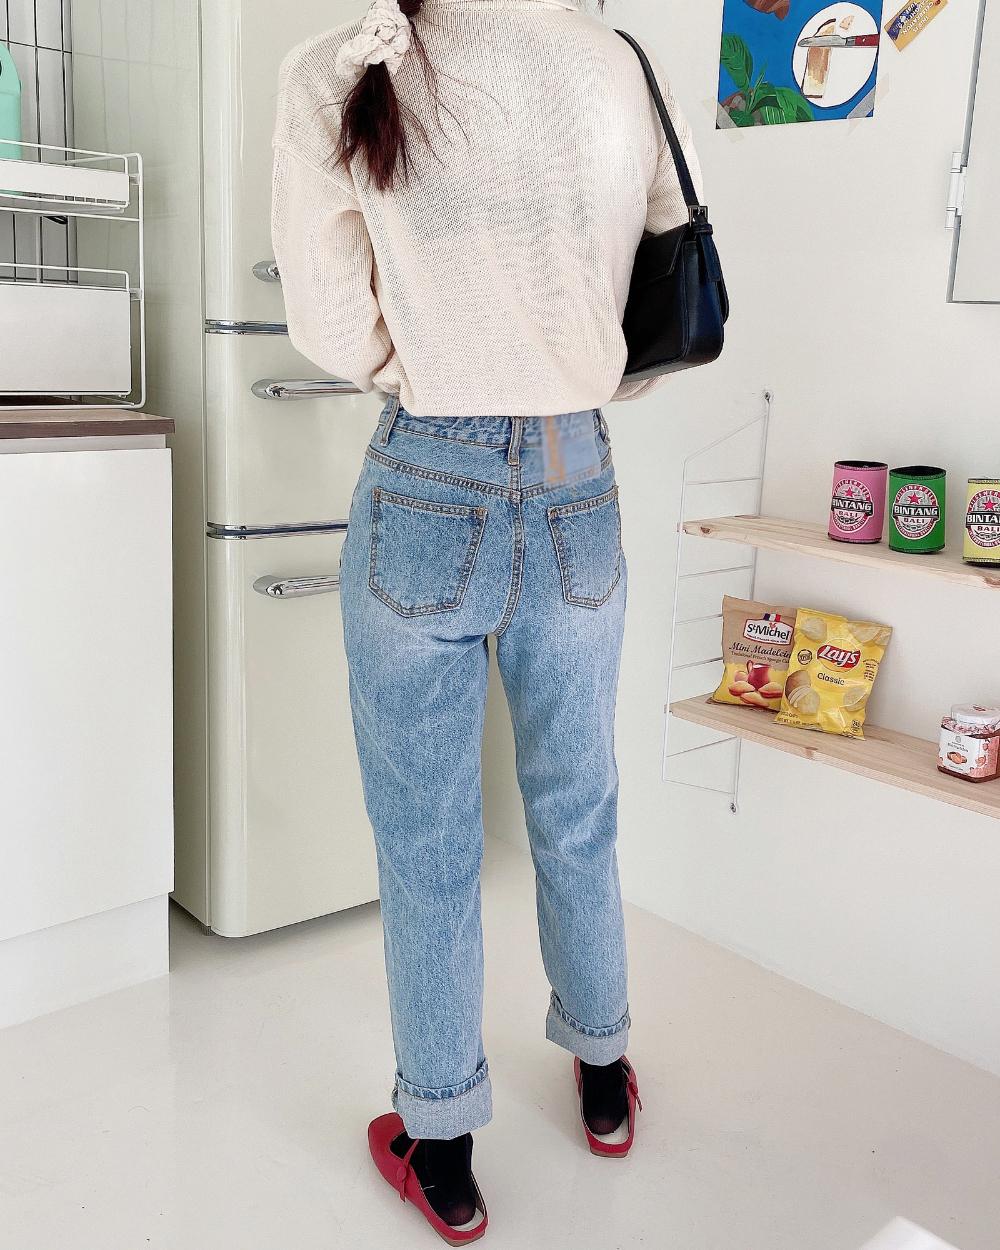 Kara Berry Twisted Knitwear